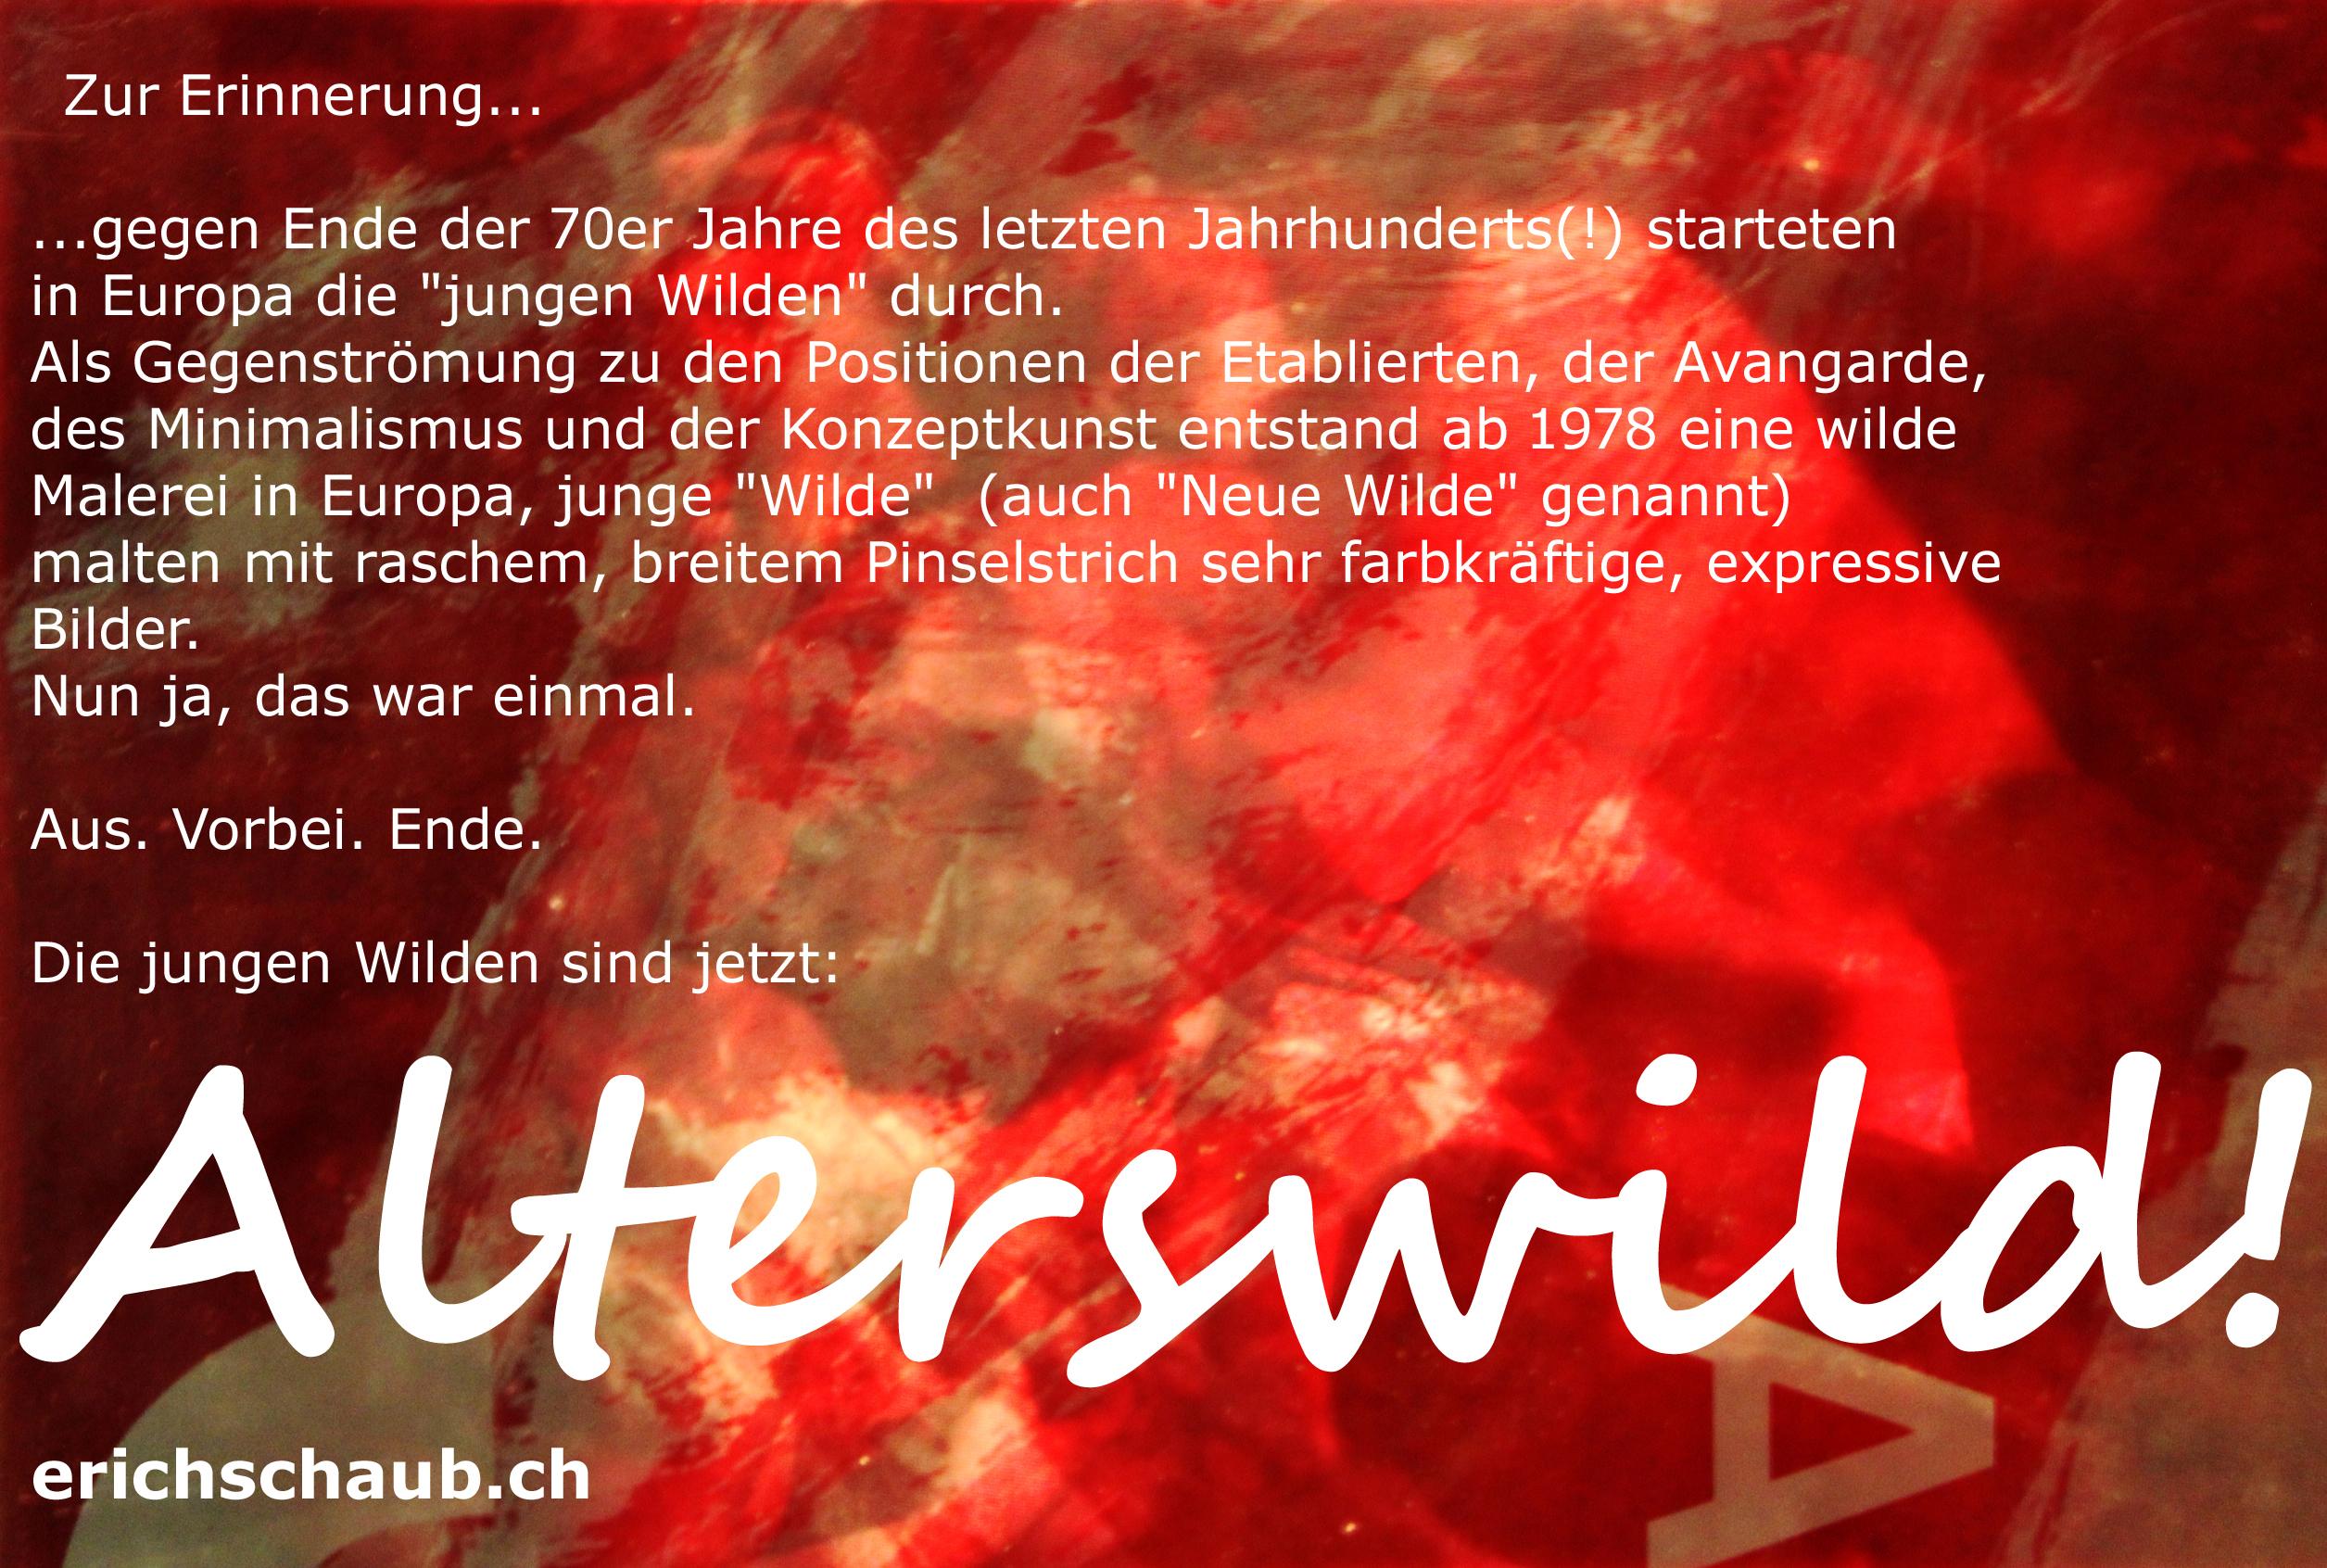 Alterswild-Logo-3jpg